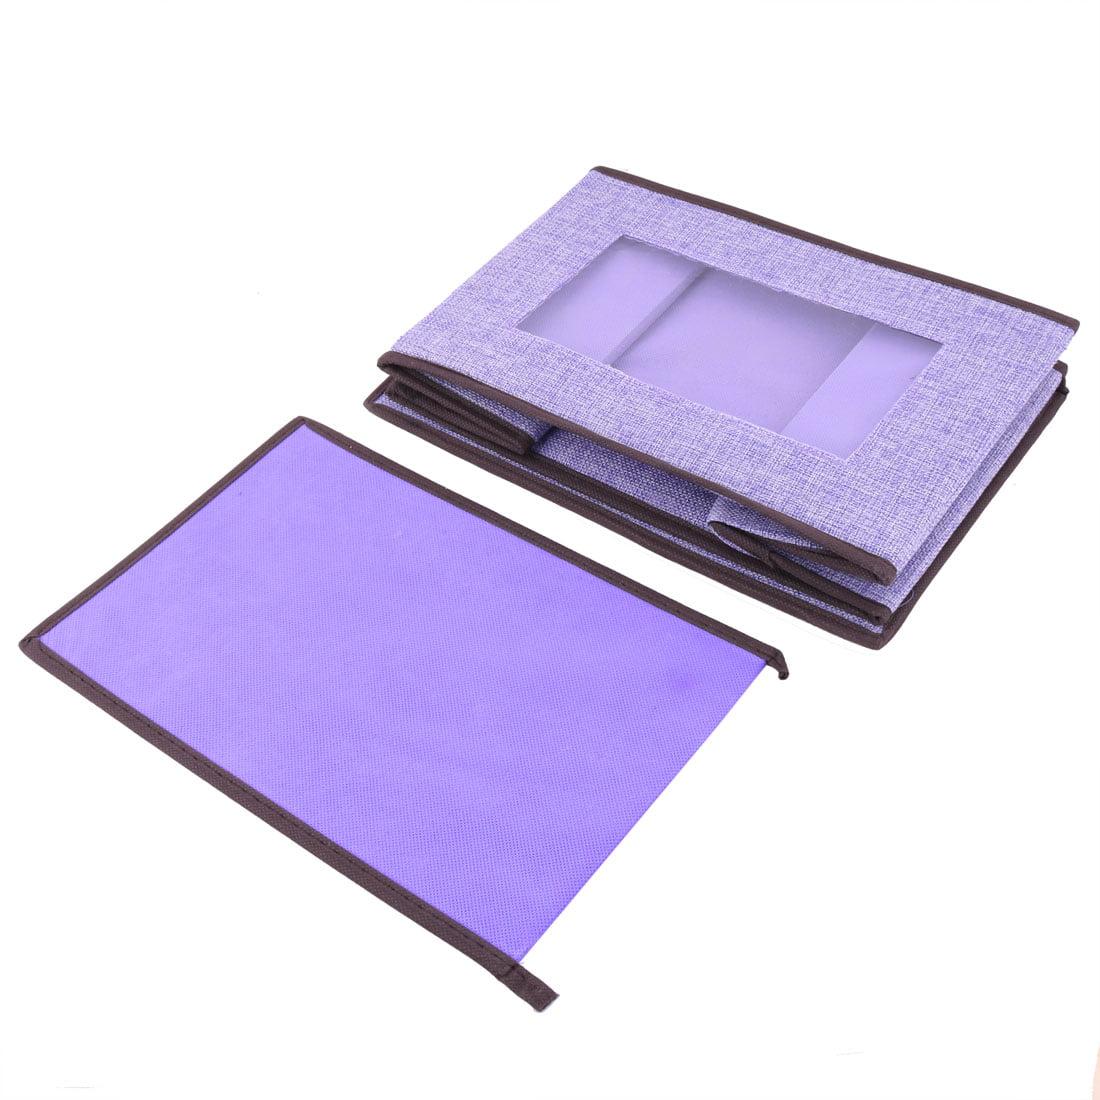 31.5 x 20.5 x 20.5cm Light Purple Linen Foldable Clothes Socks Organizer Box Holder - image 2 of 3